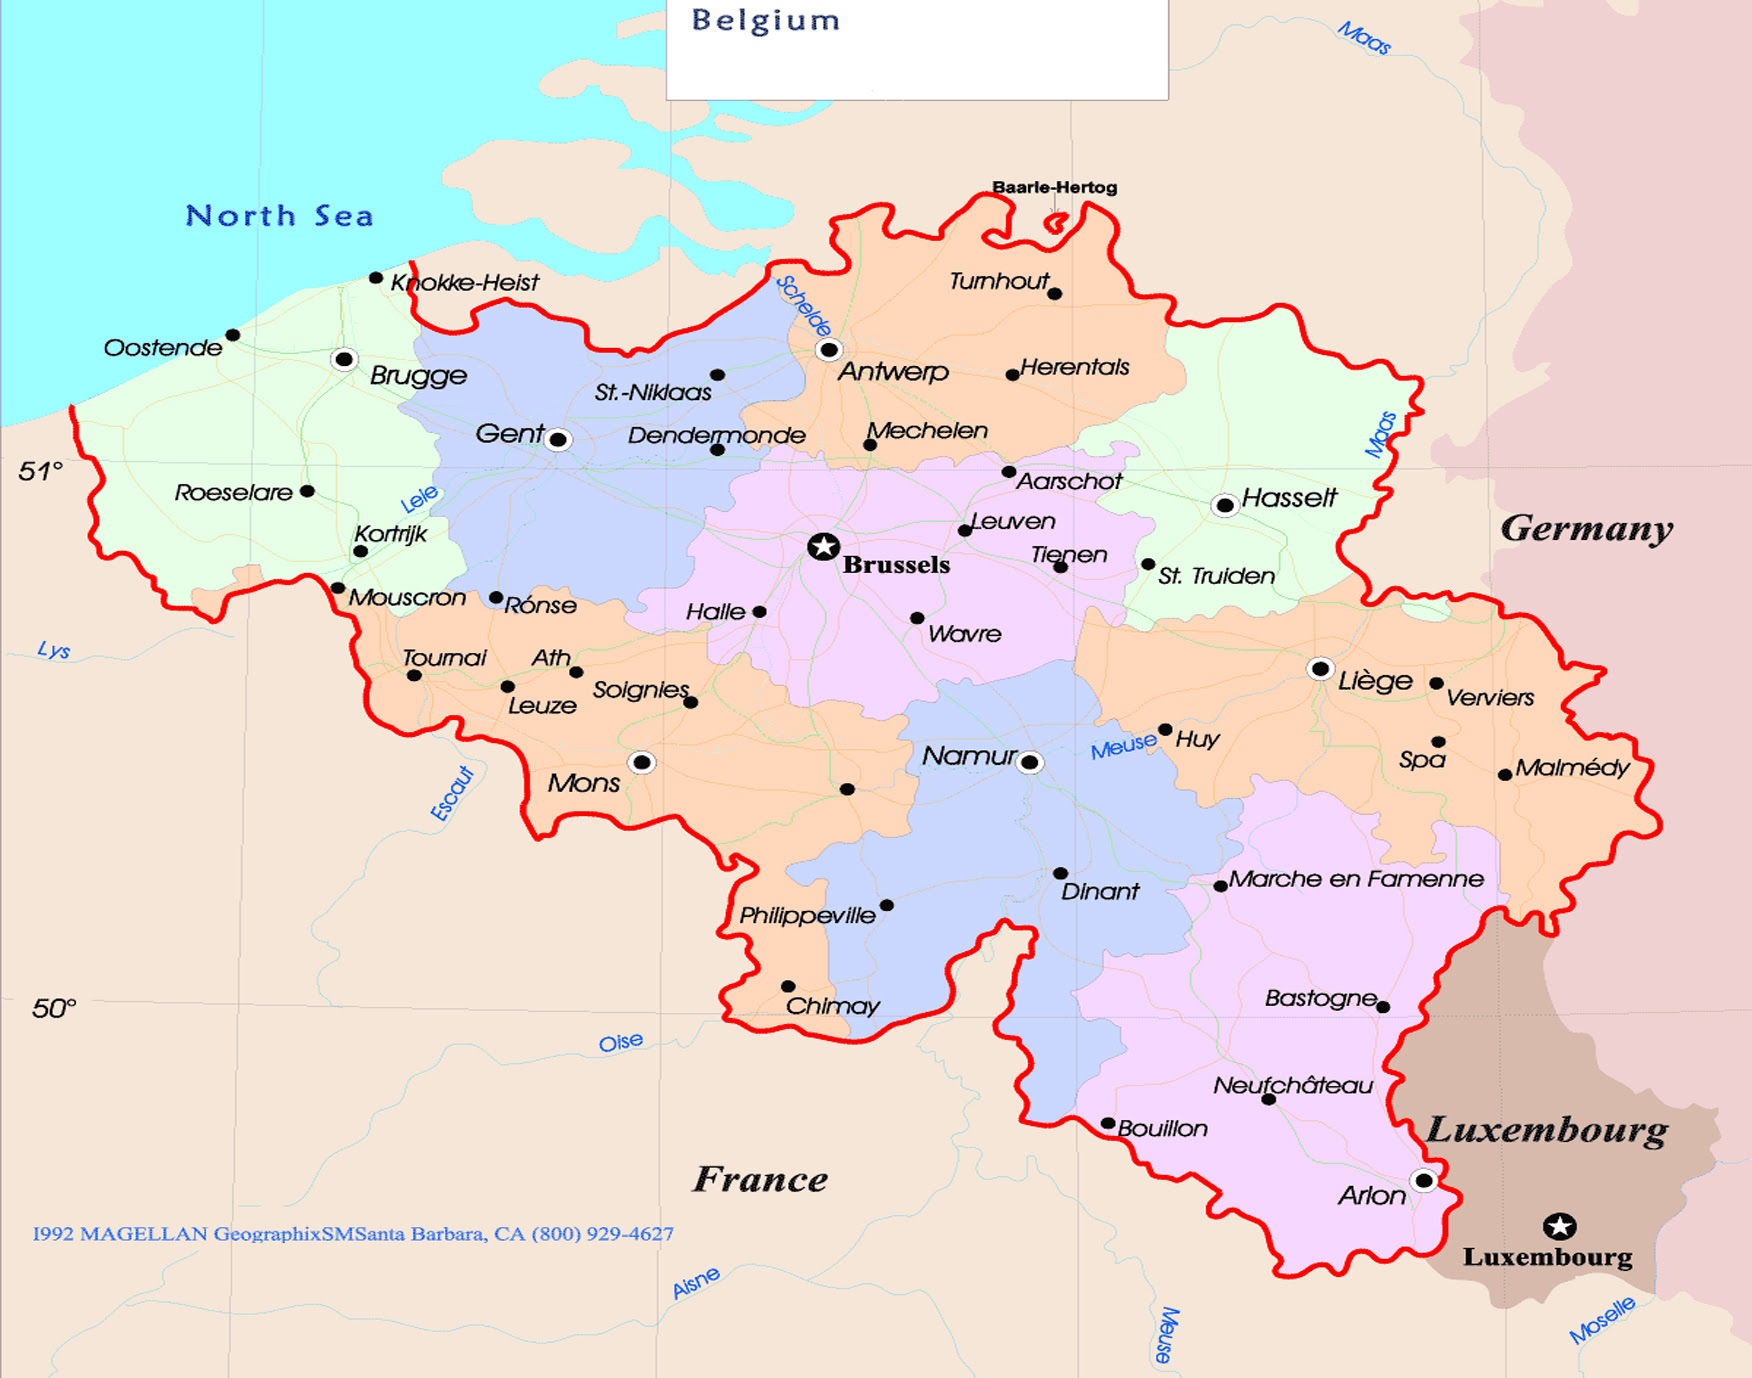 The Map Of Belgium